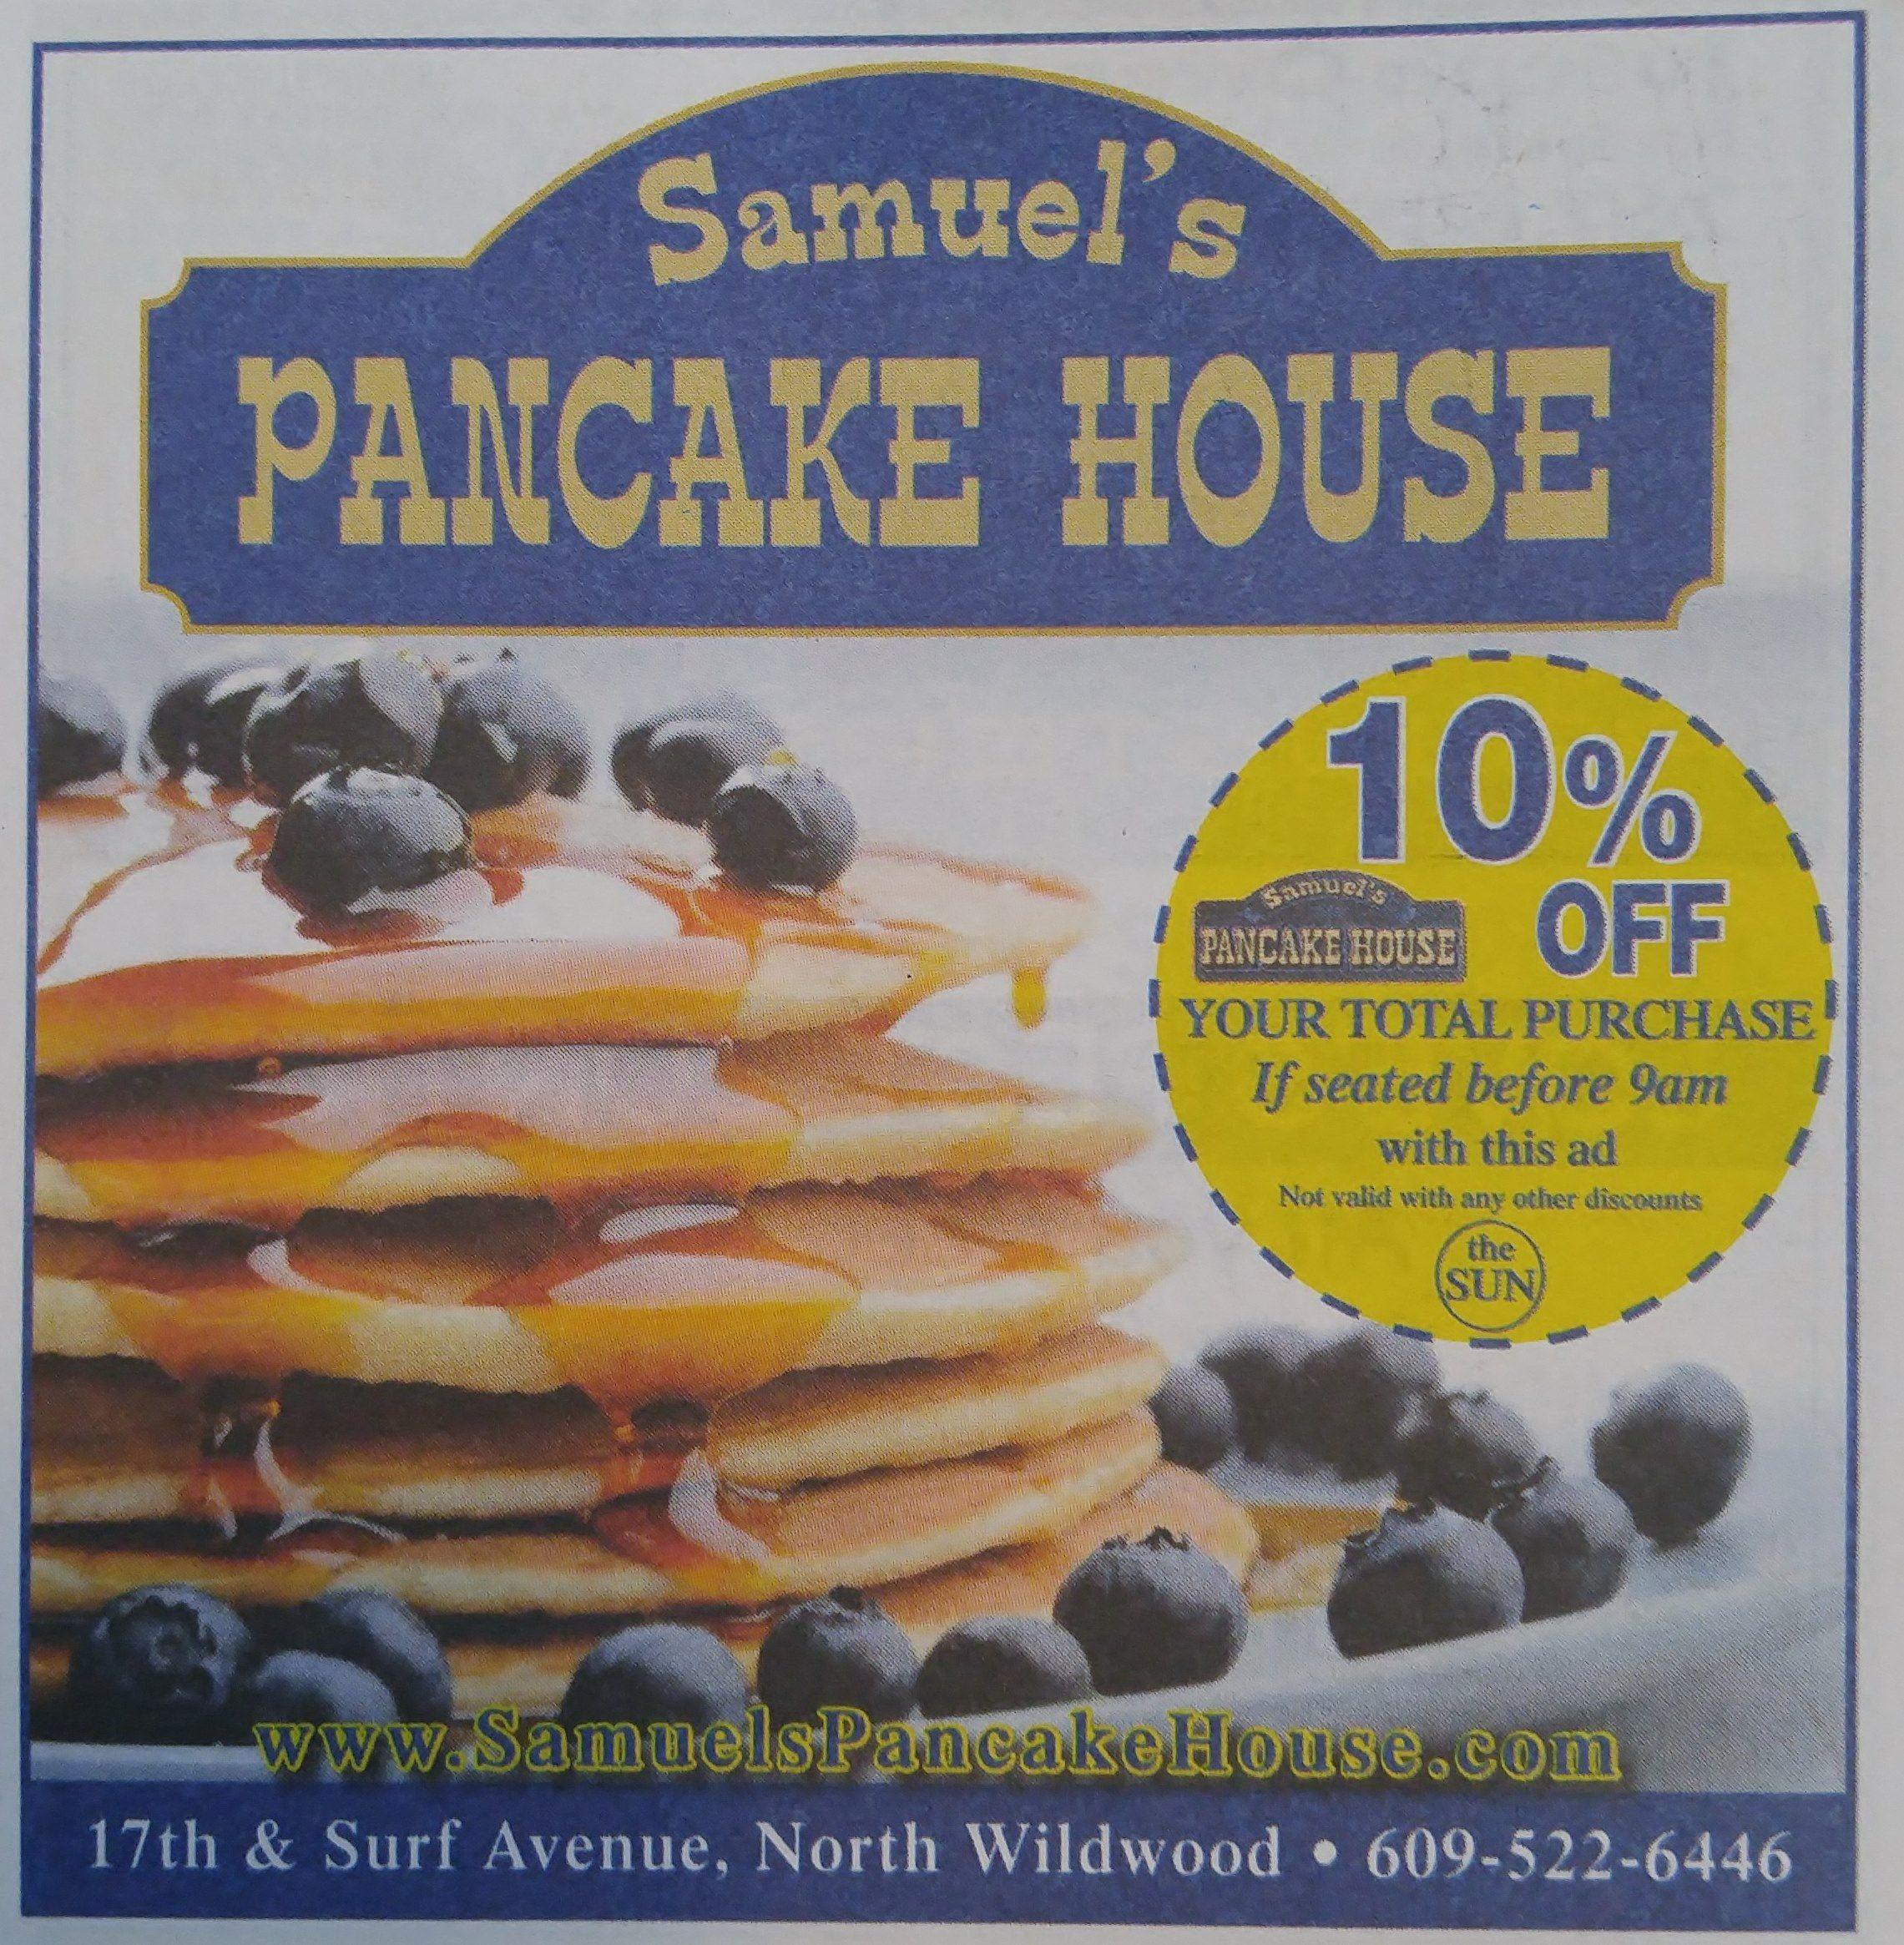 Samuel S Pancake House Newspaper The Sun May June 2016 The Pancake House Wildwood Restaurant North Wildwood